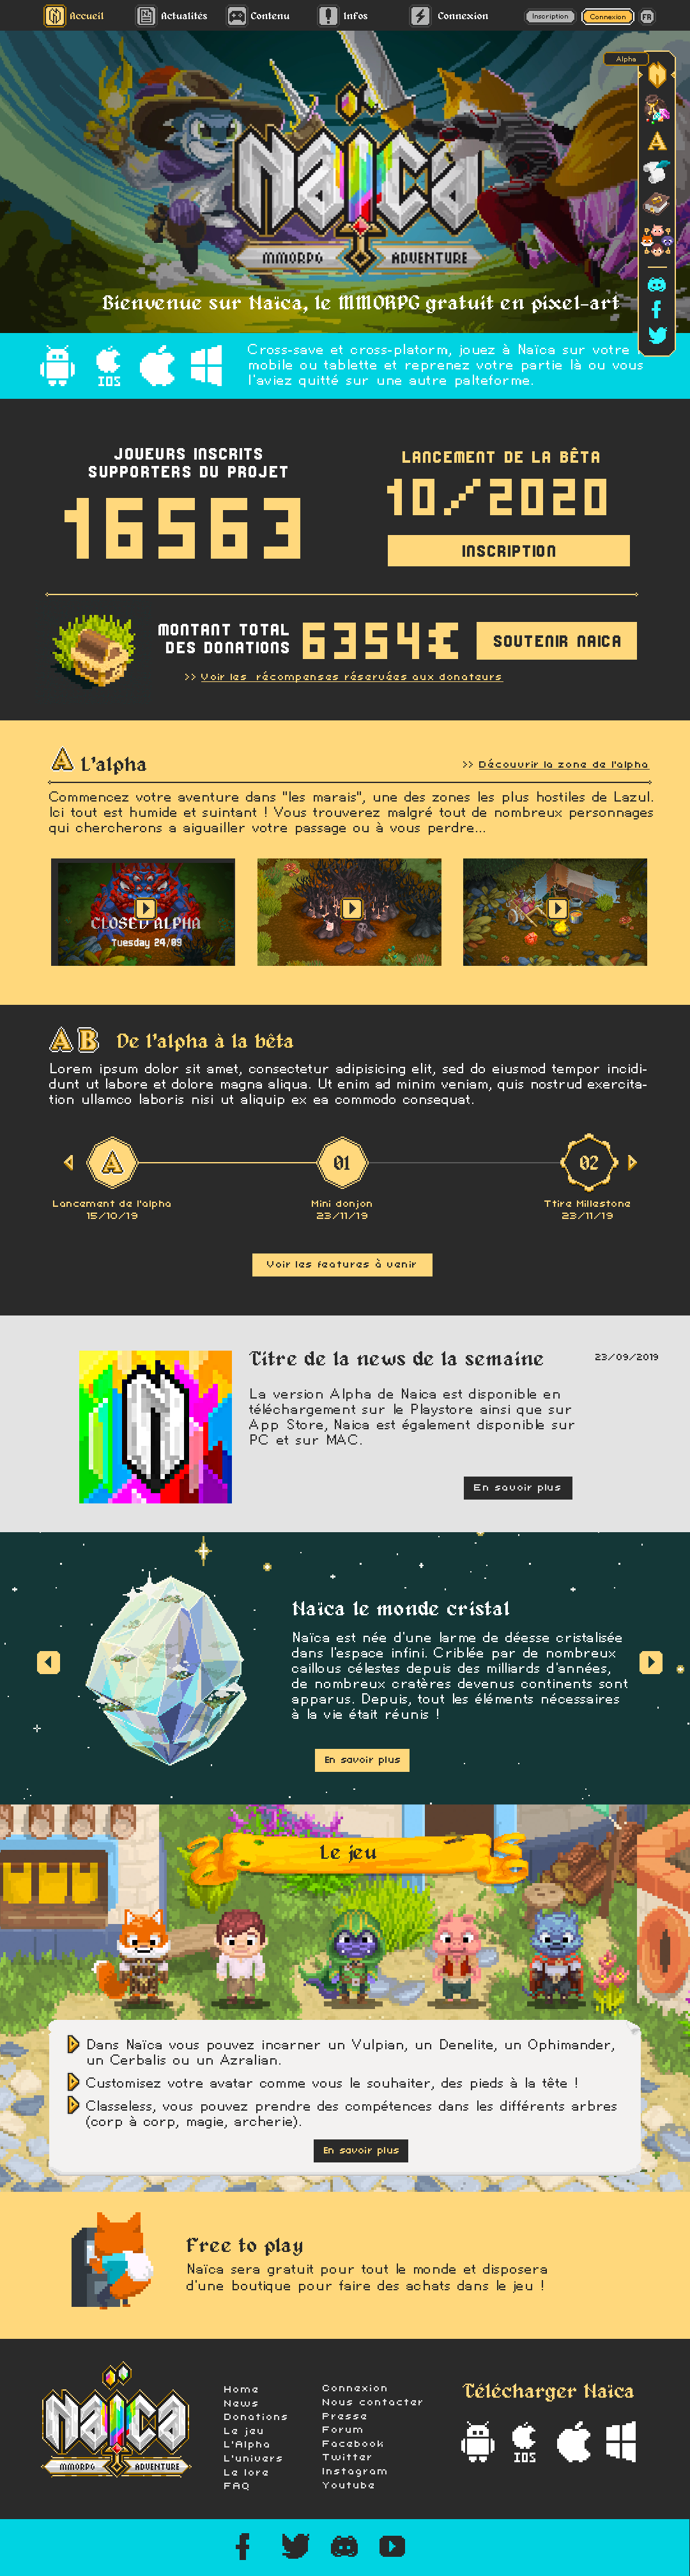 Home page du site Naïca